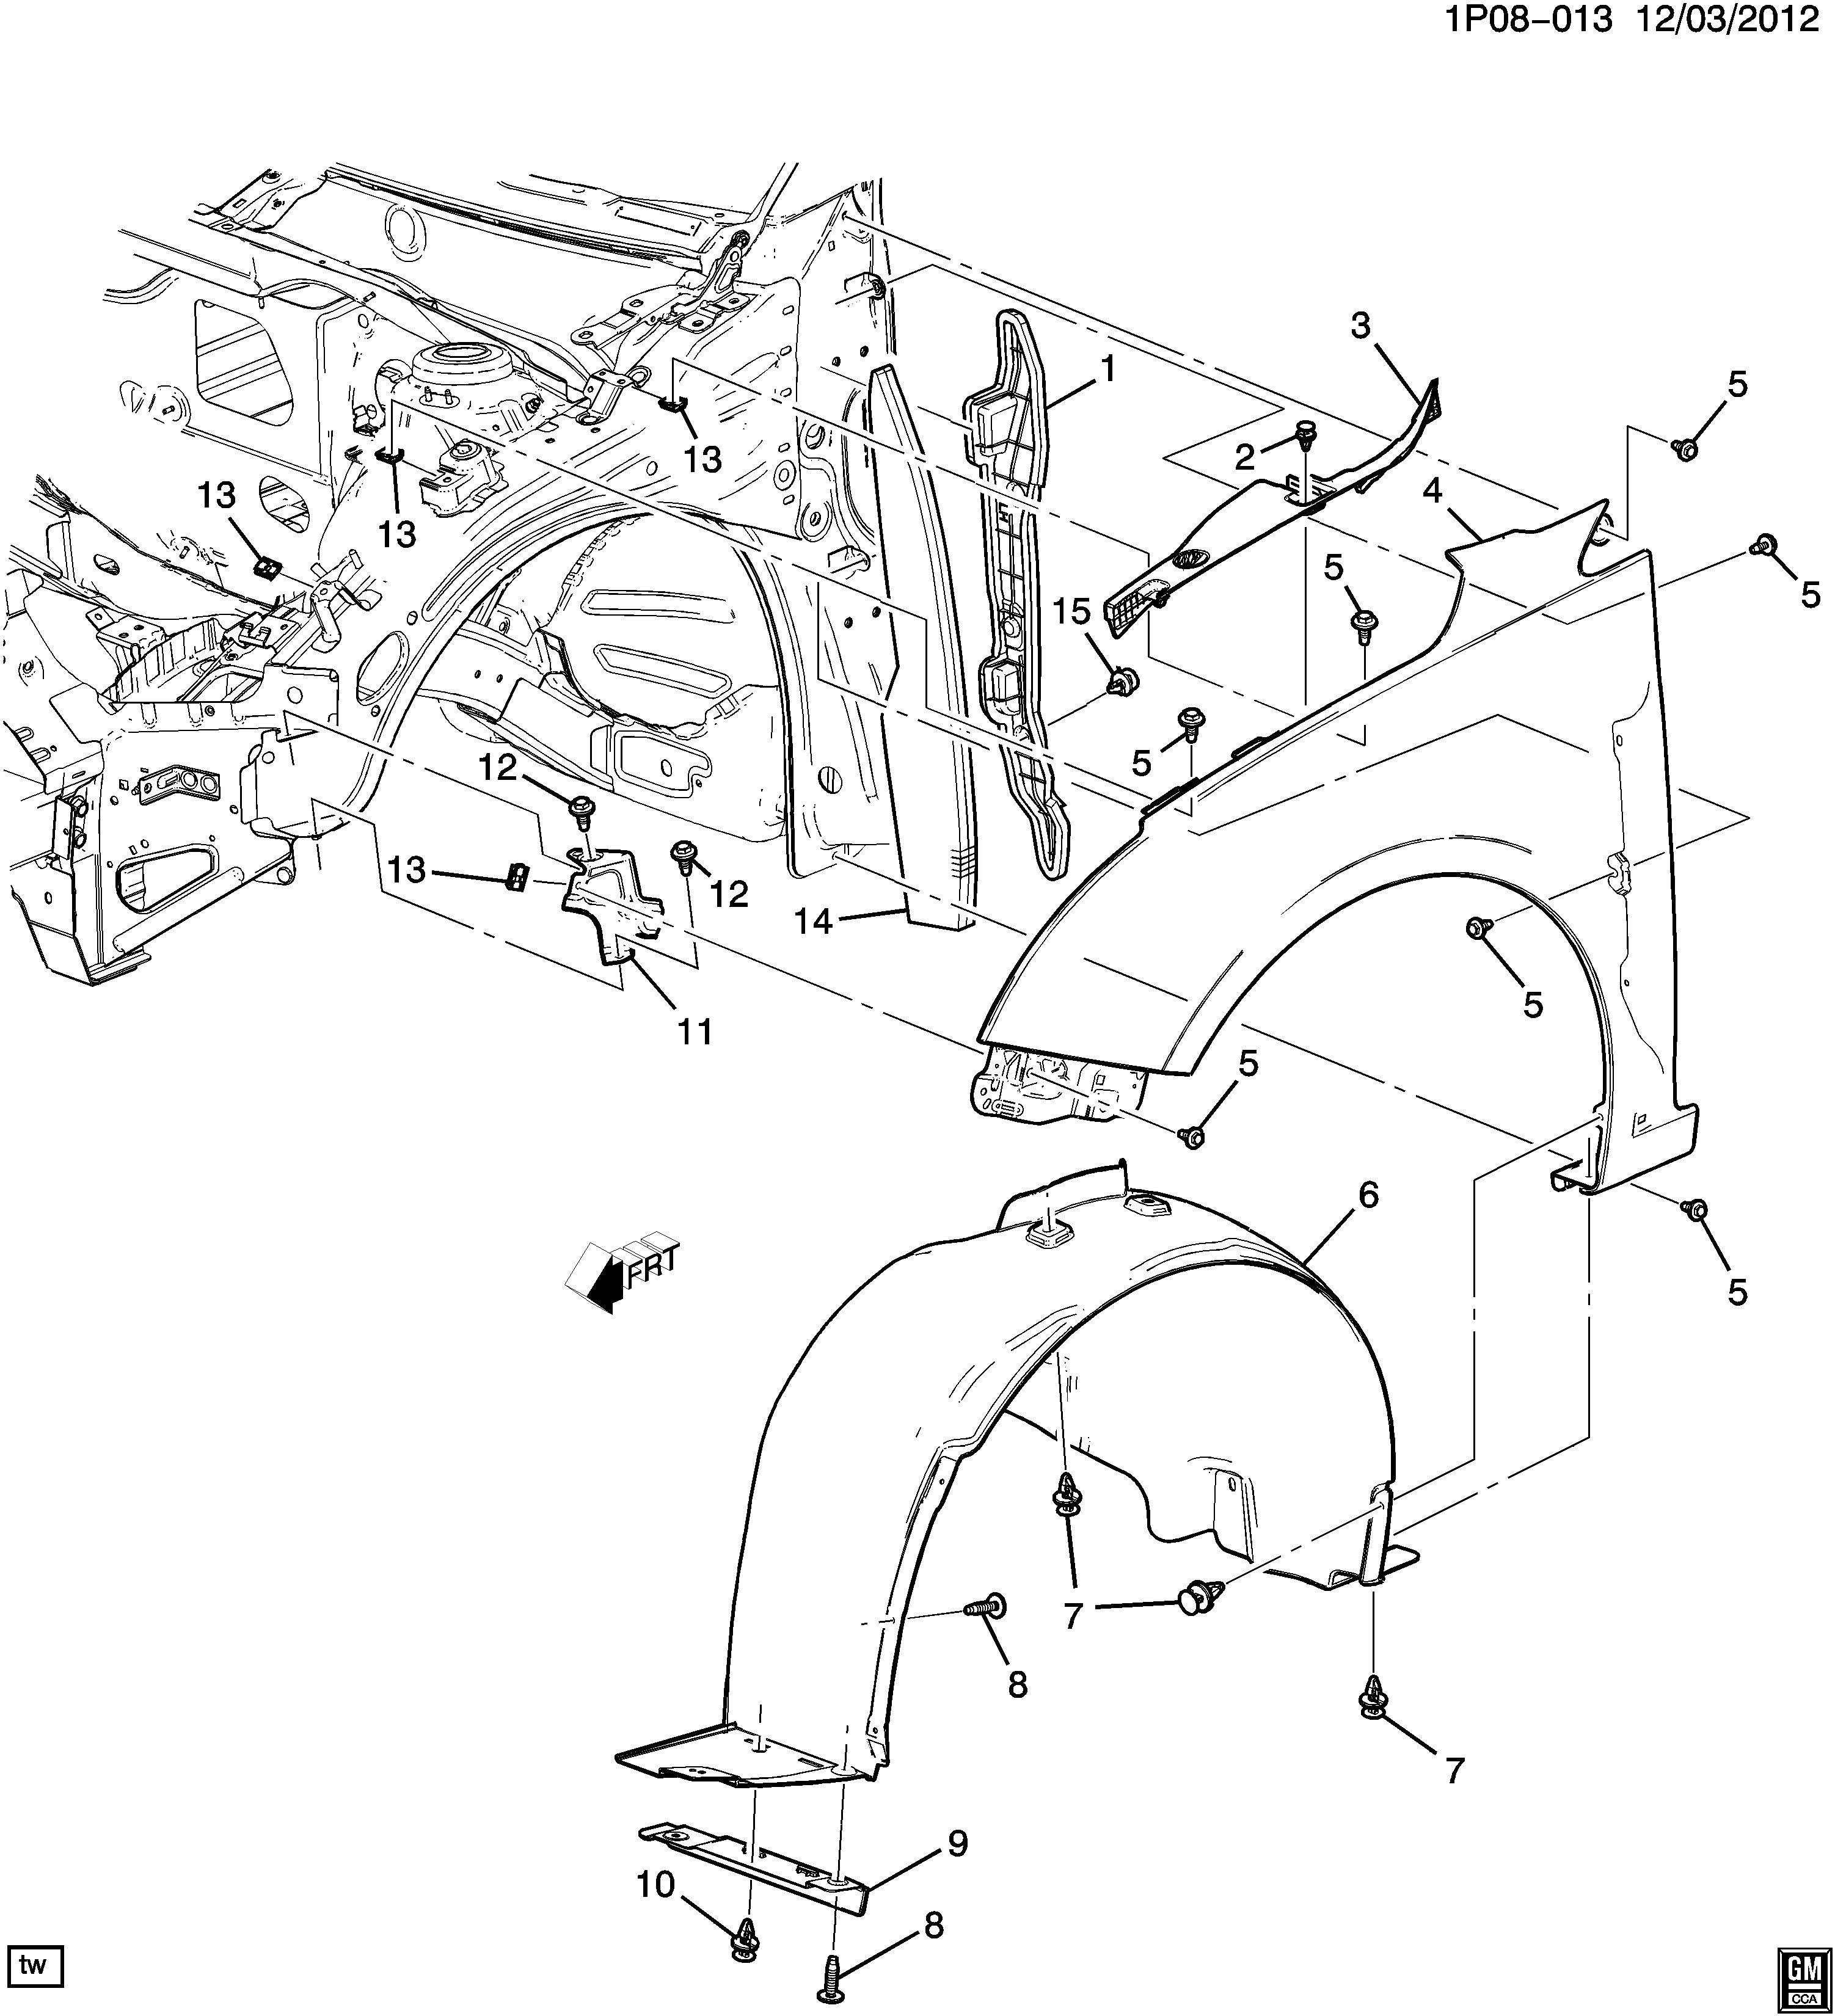 Chevrolet Cruze FENDER & WHEELHOUSE/FRONT END